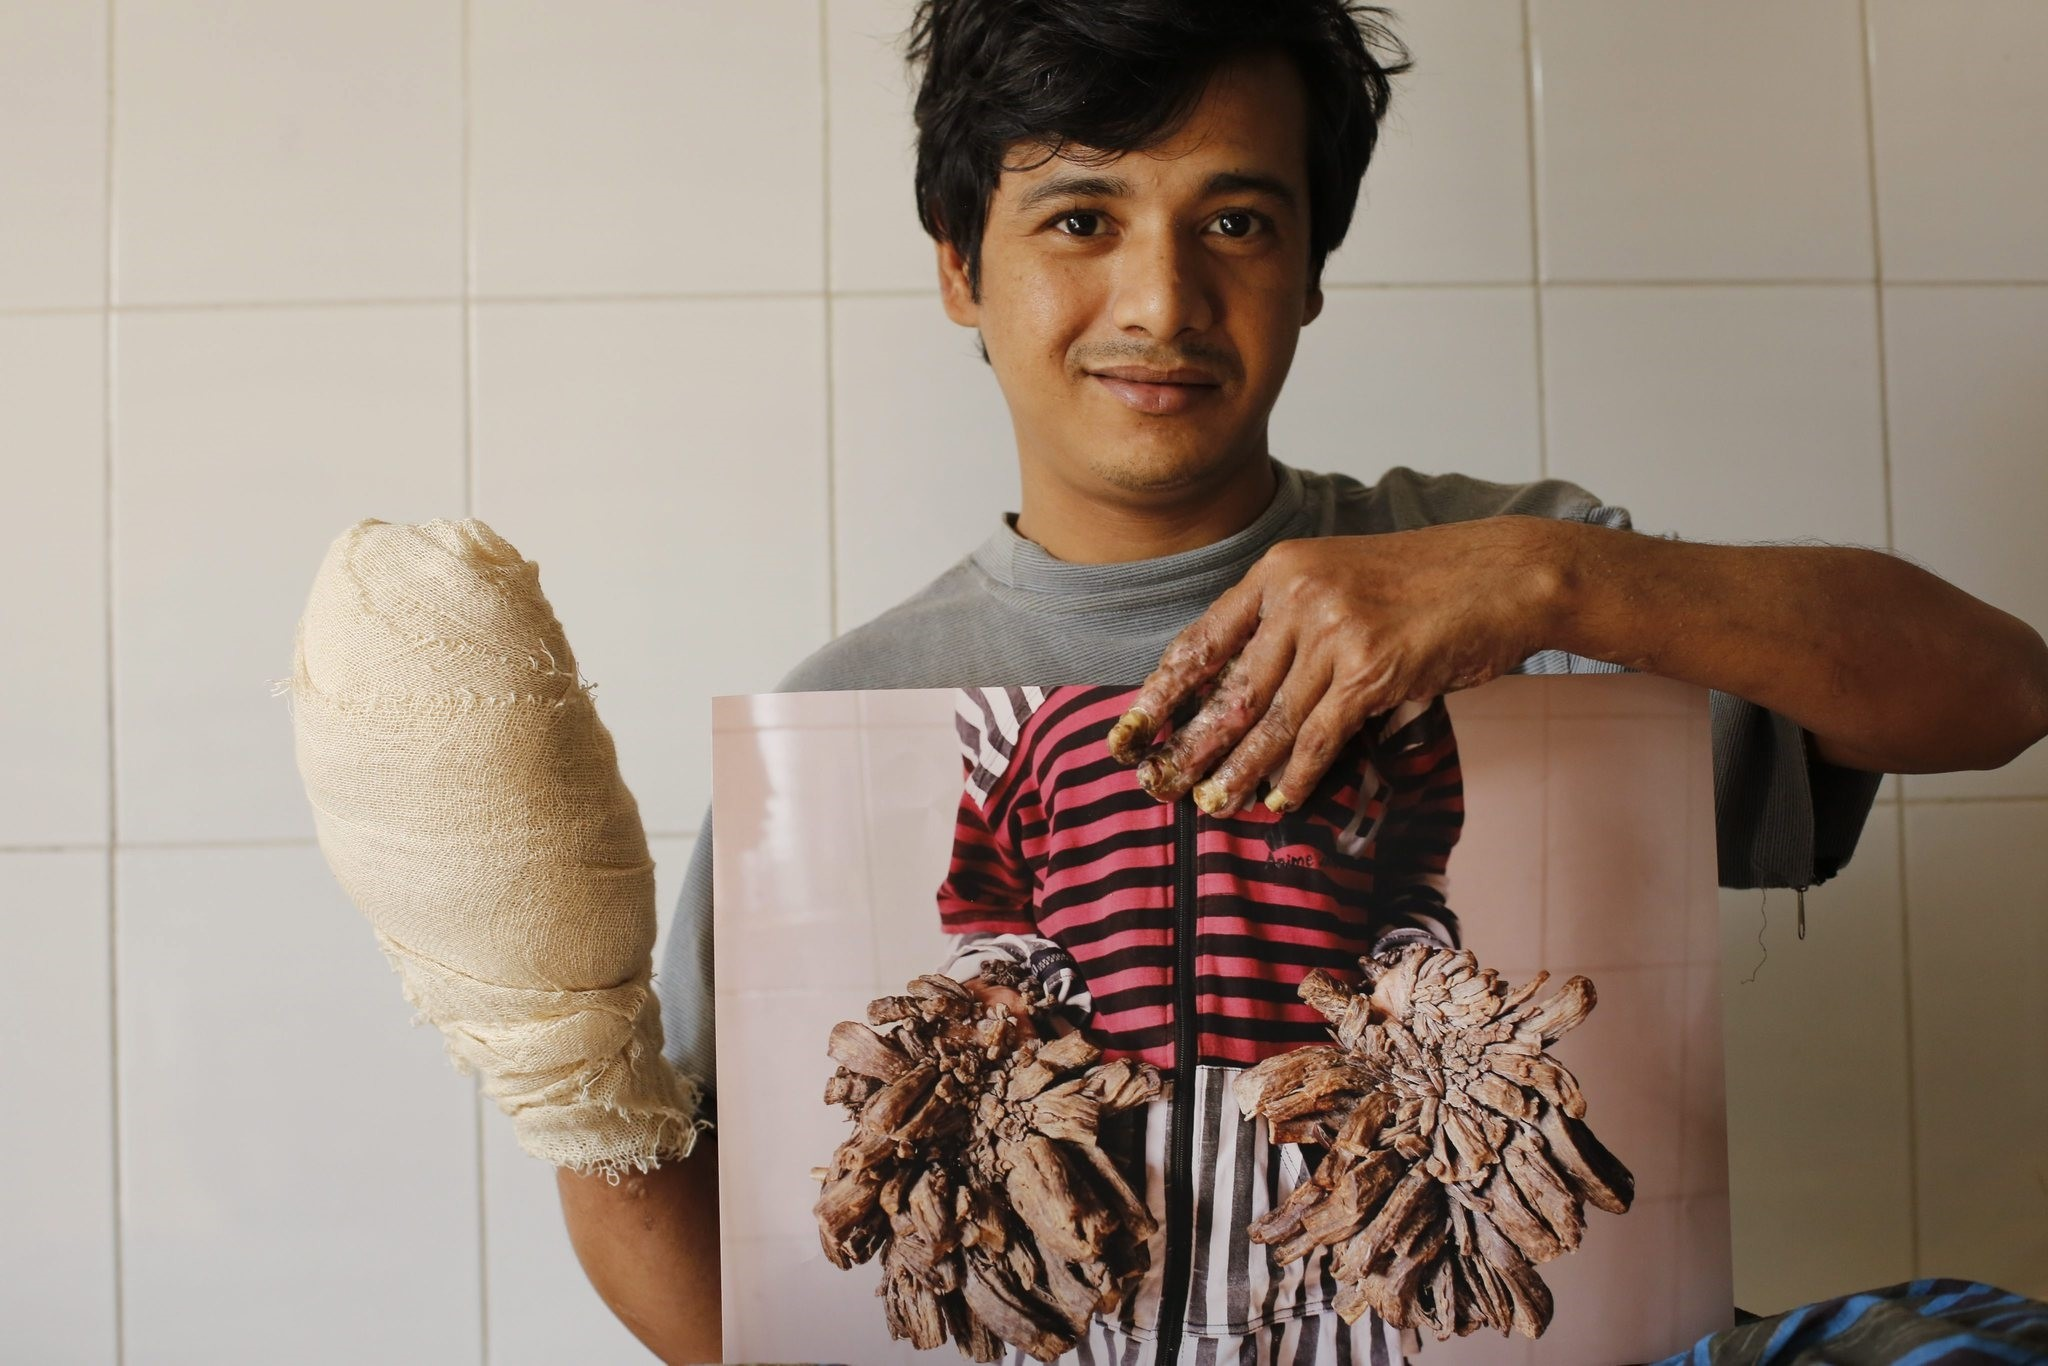 bul Bajandar, a patient diagnosed with epidermodysplasia verruciformis (EV), a rare skin disease, shows a photograph of his hands before operation. (EPA Photo)